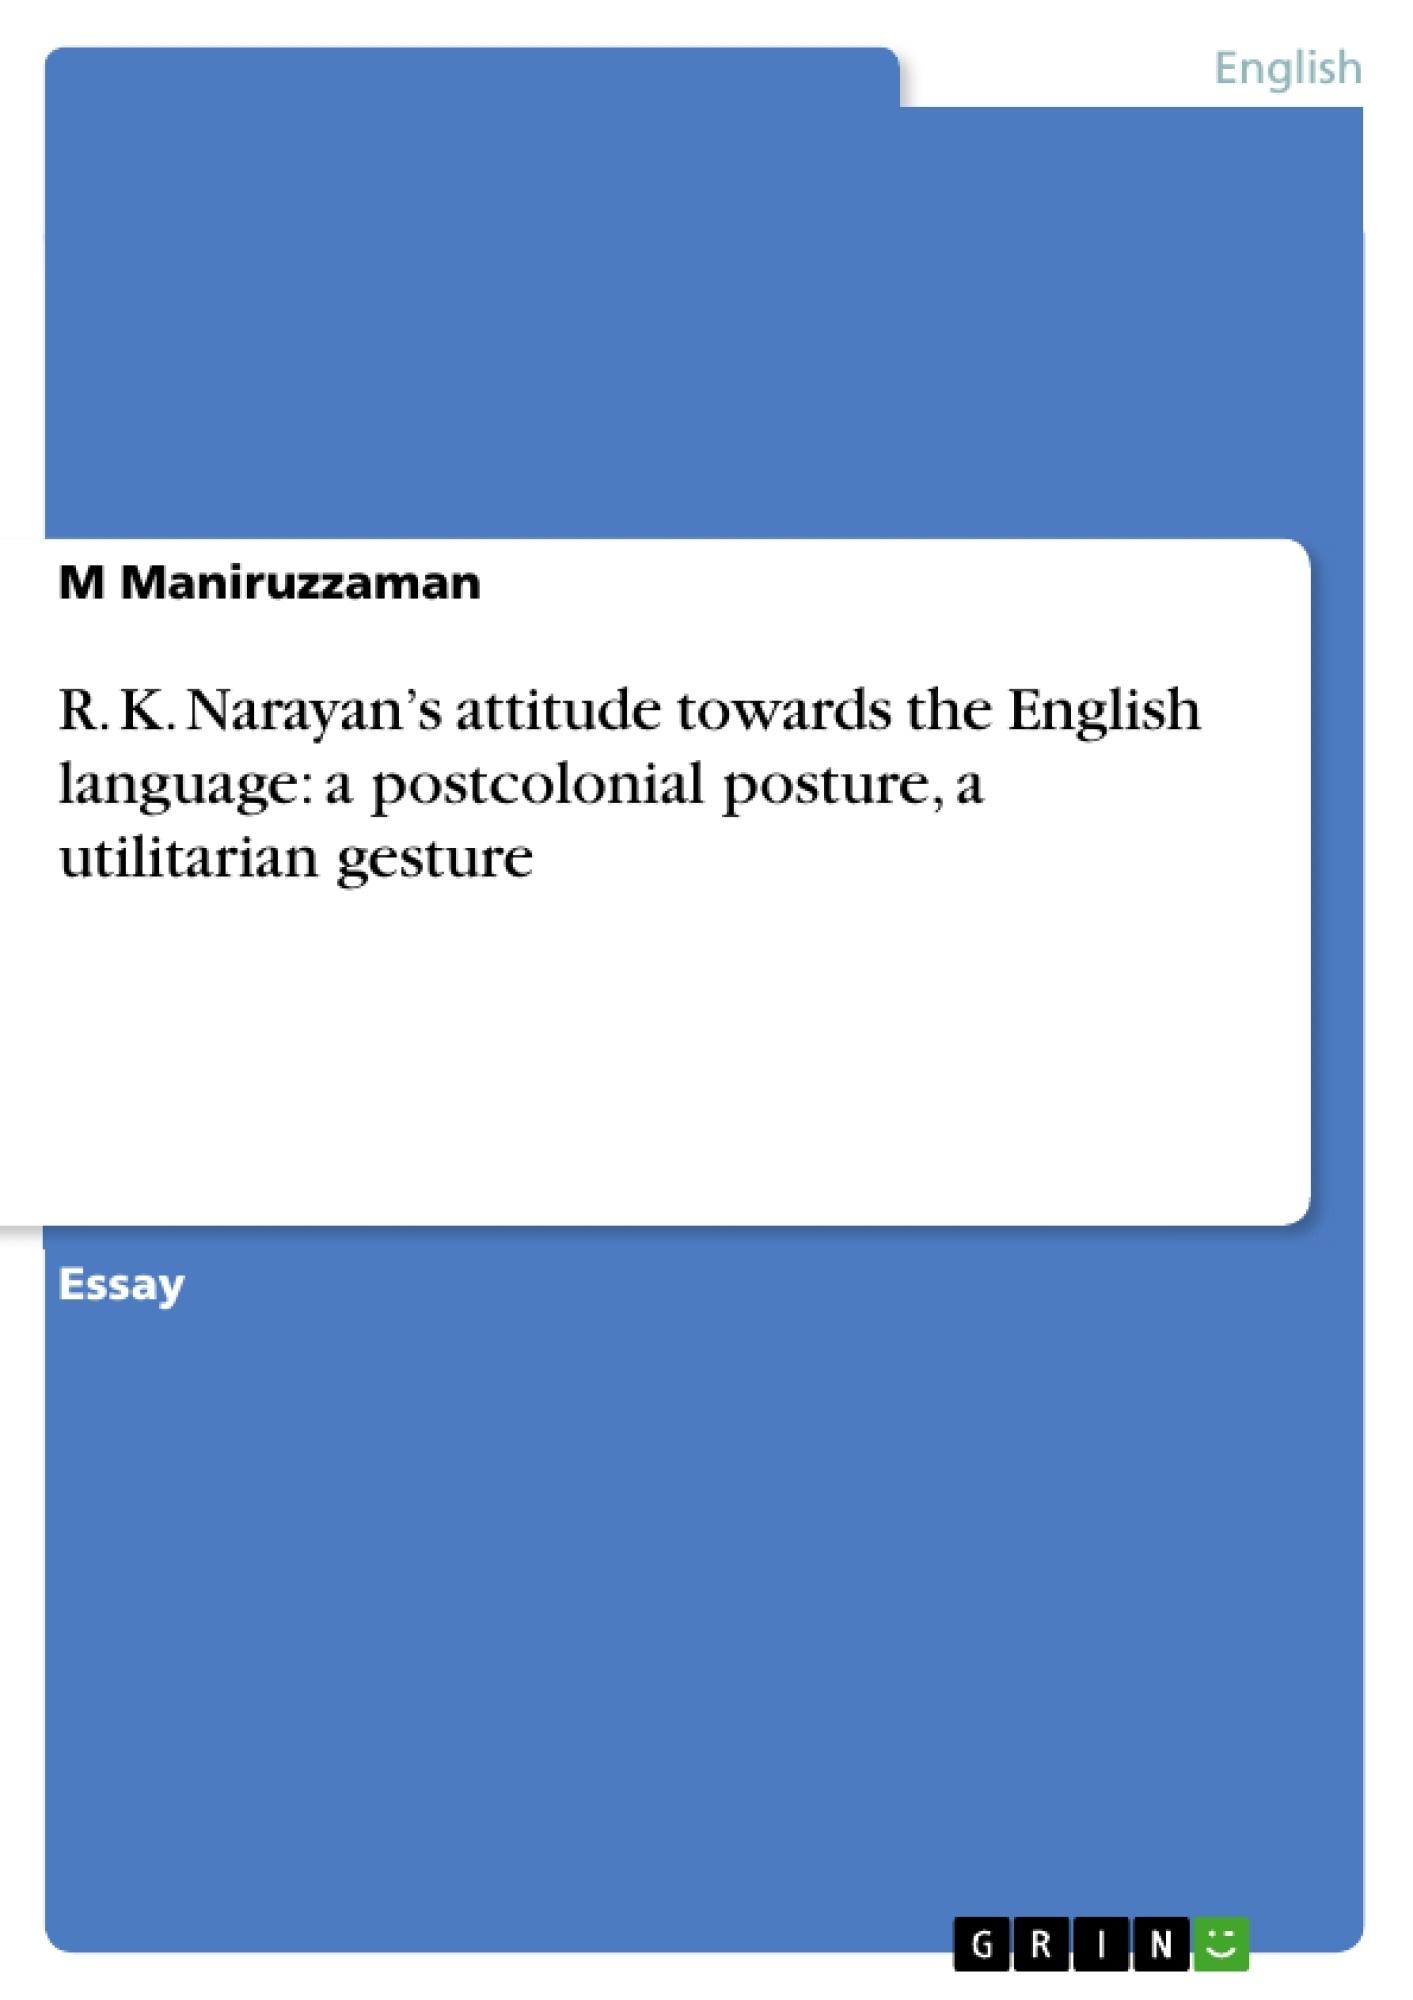 Title: R. K. Narayan's attitude towards the English language:  a postcolonial posture,  a utilitarian gesture